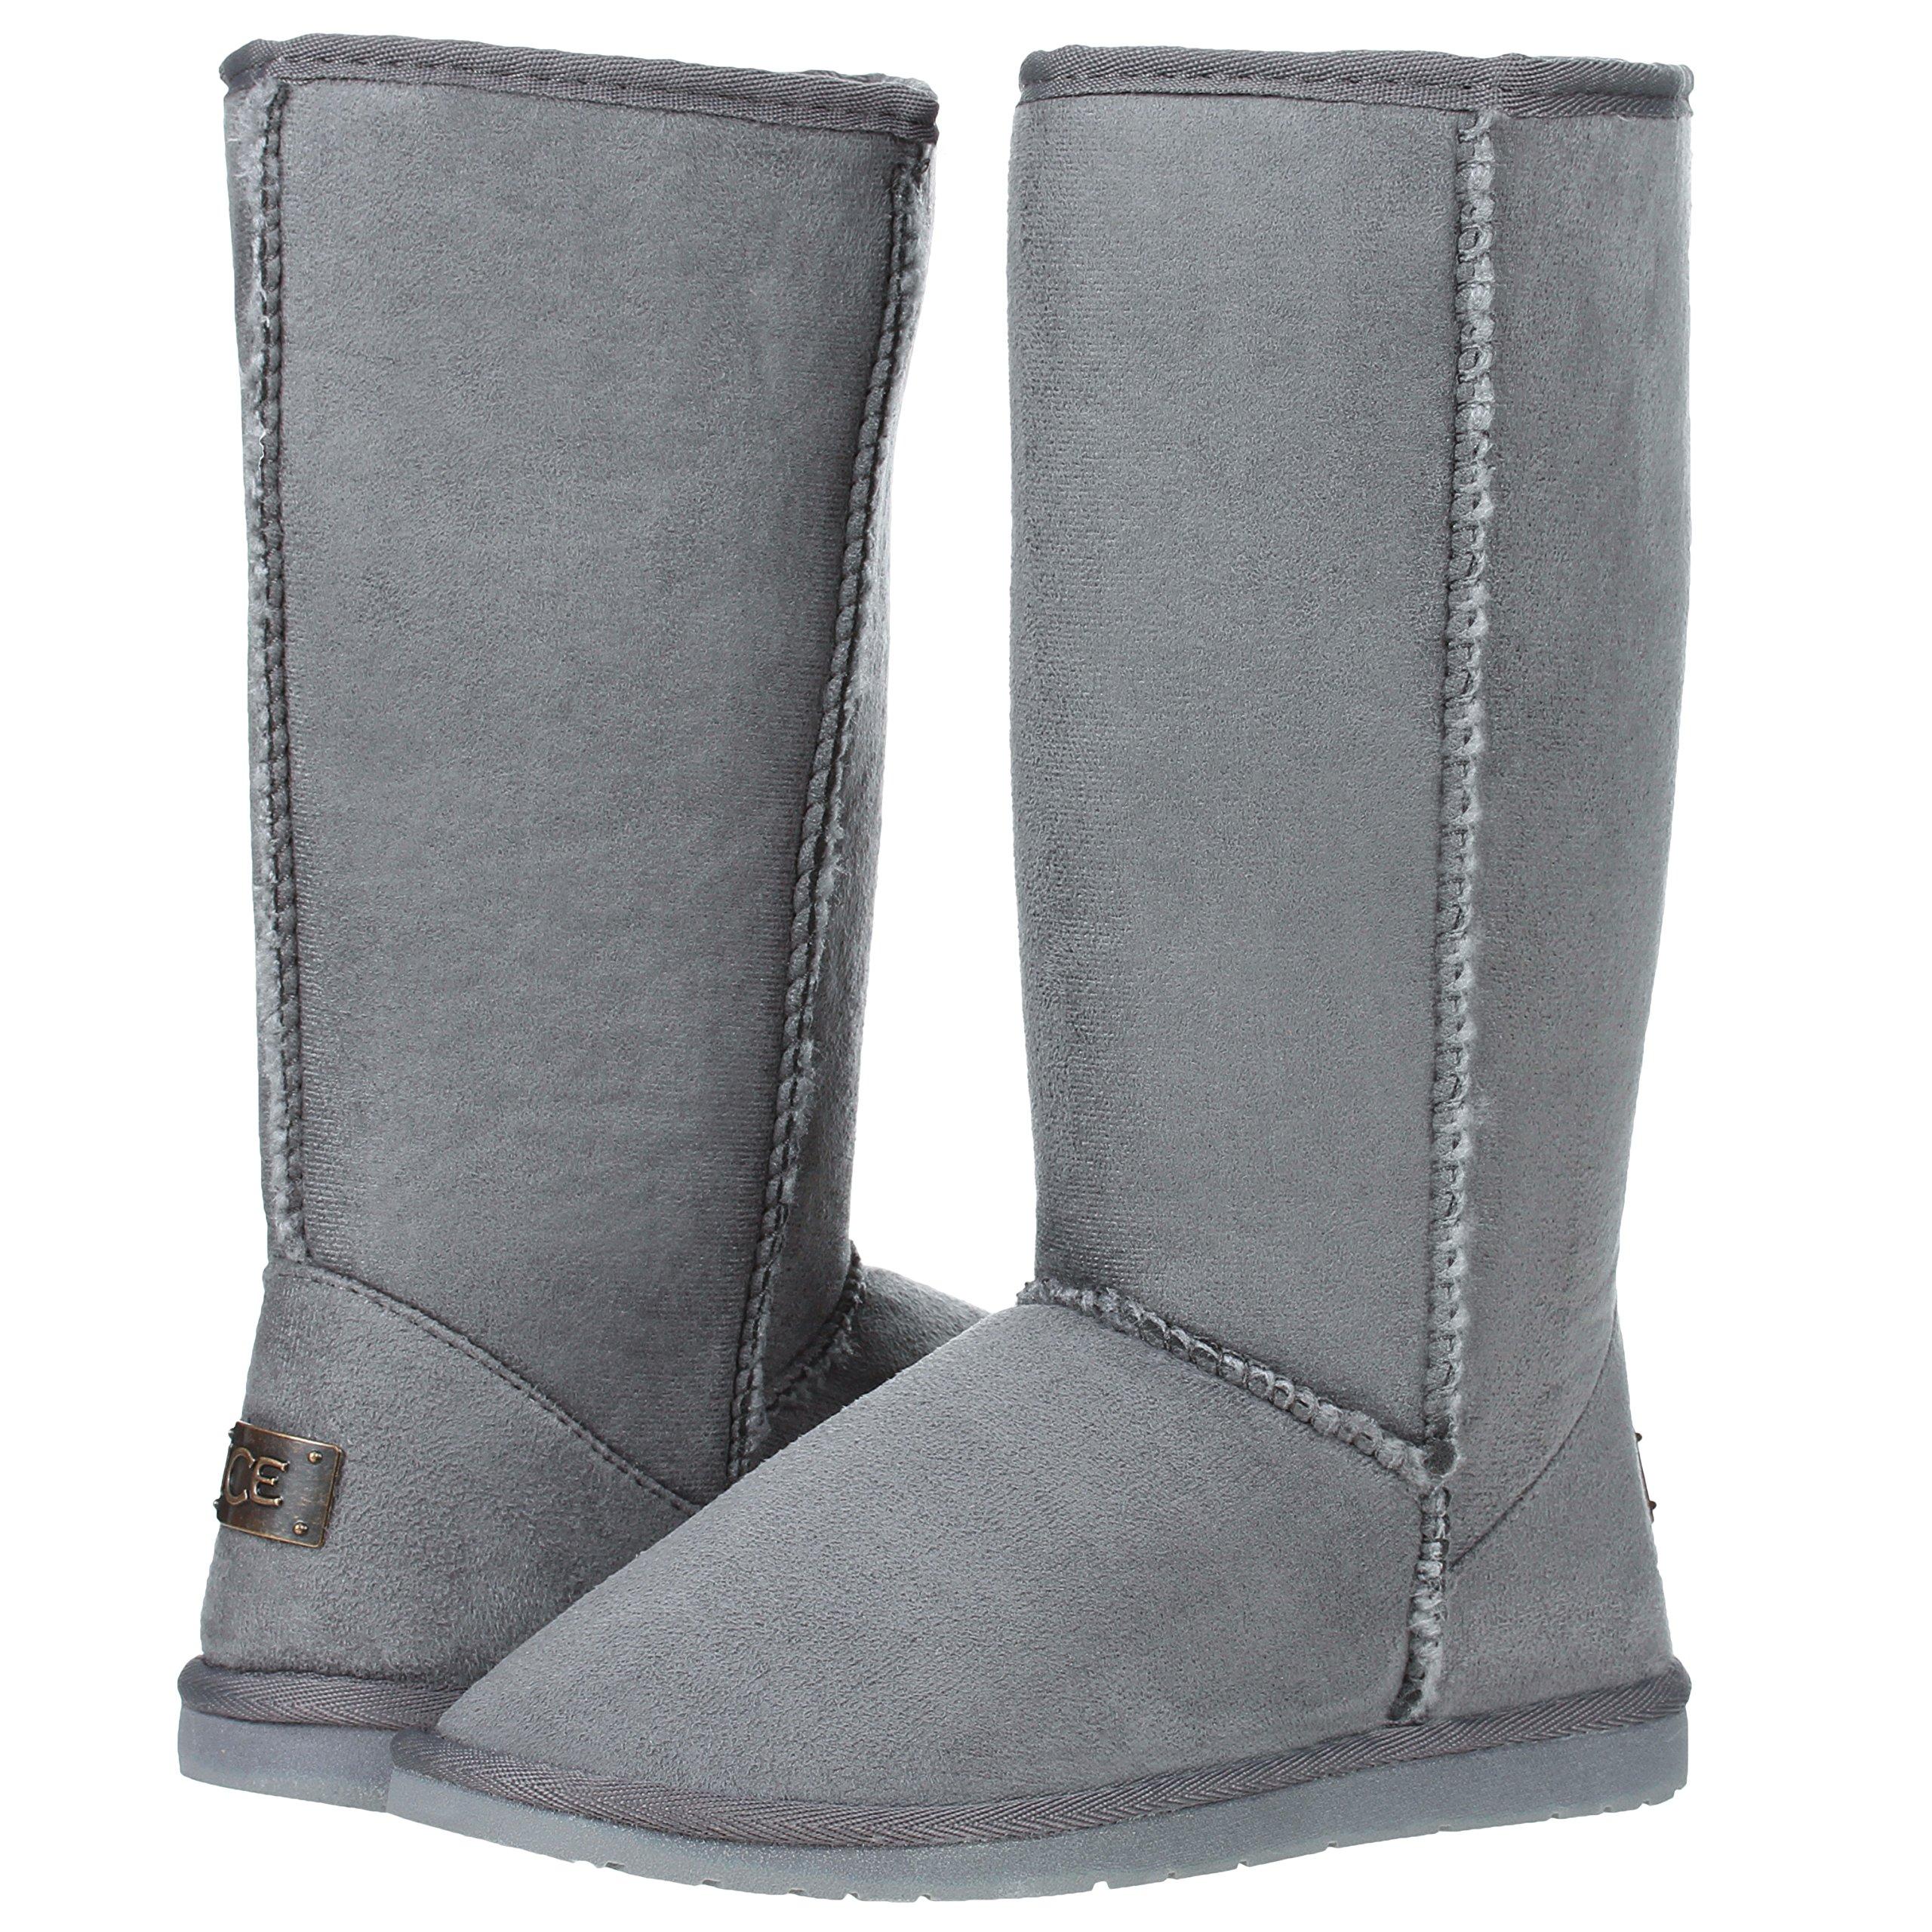 Women's Mid Calf Classic Tall Winter Snow Fur Boots (8, Gray)